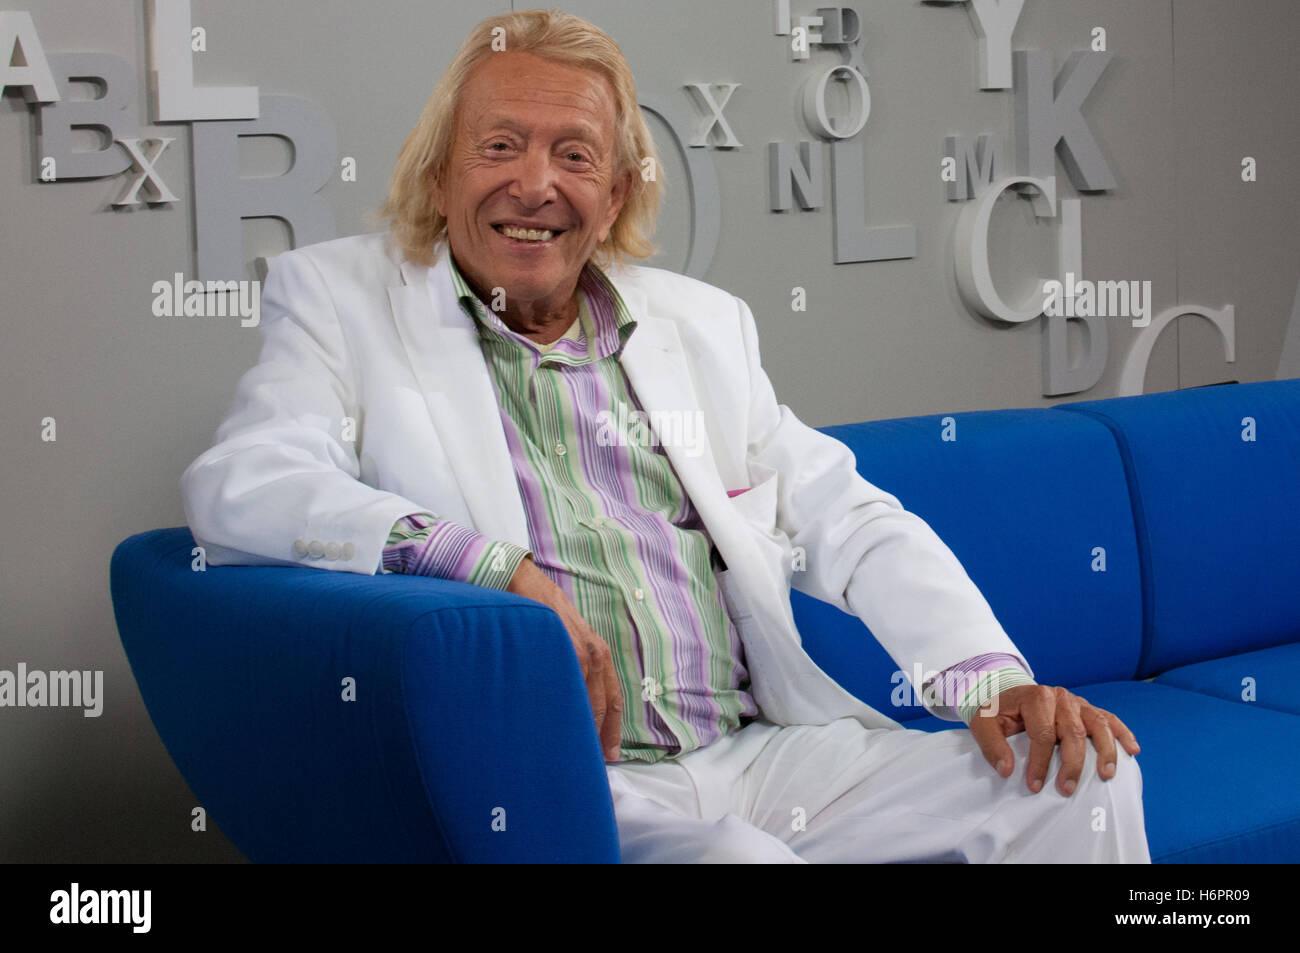 Rolf Frankfurt german rolf visited the frankfurt bookfair 2012 to